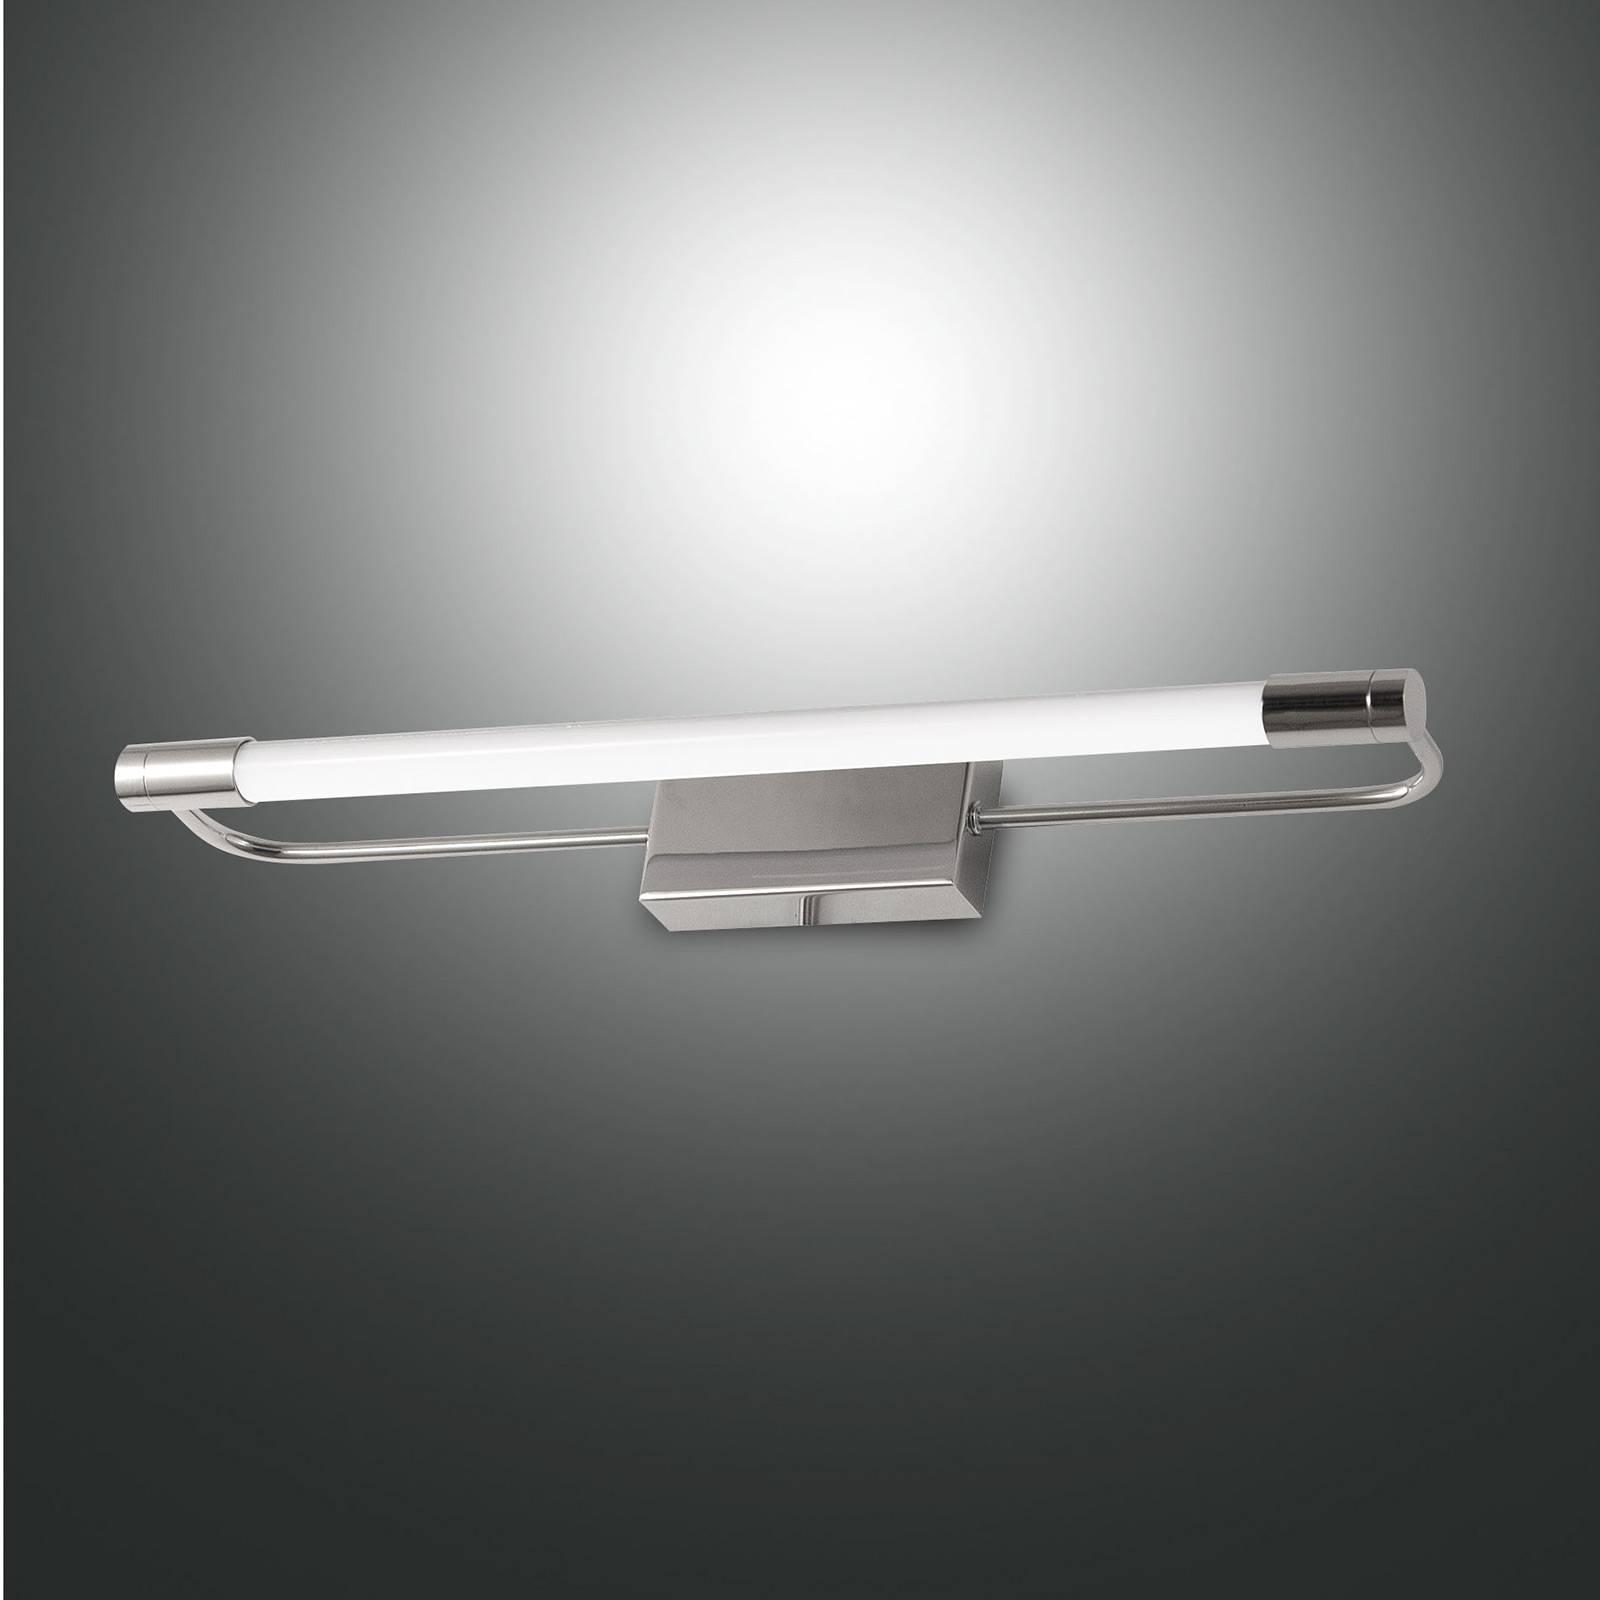 LED-Wandleuchte Rapallo, chrom, IP44, 40 cm